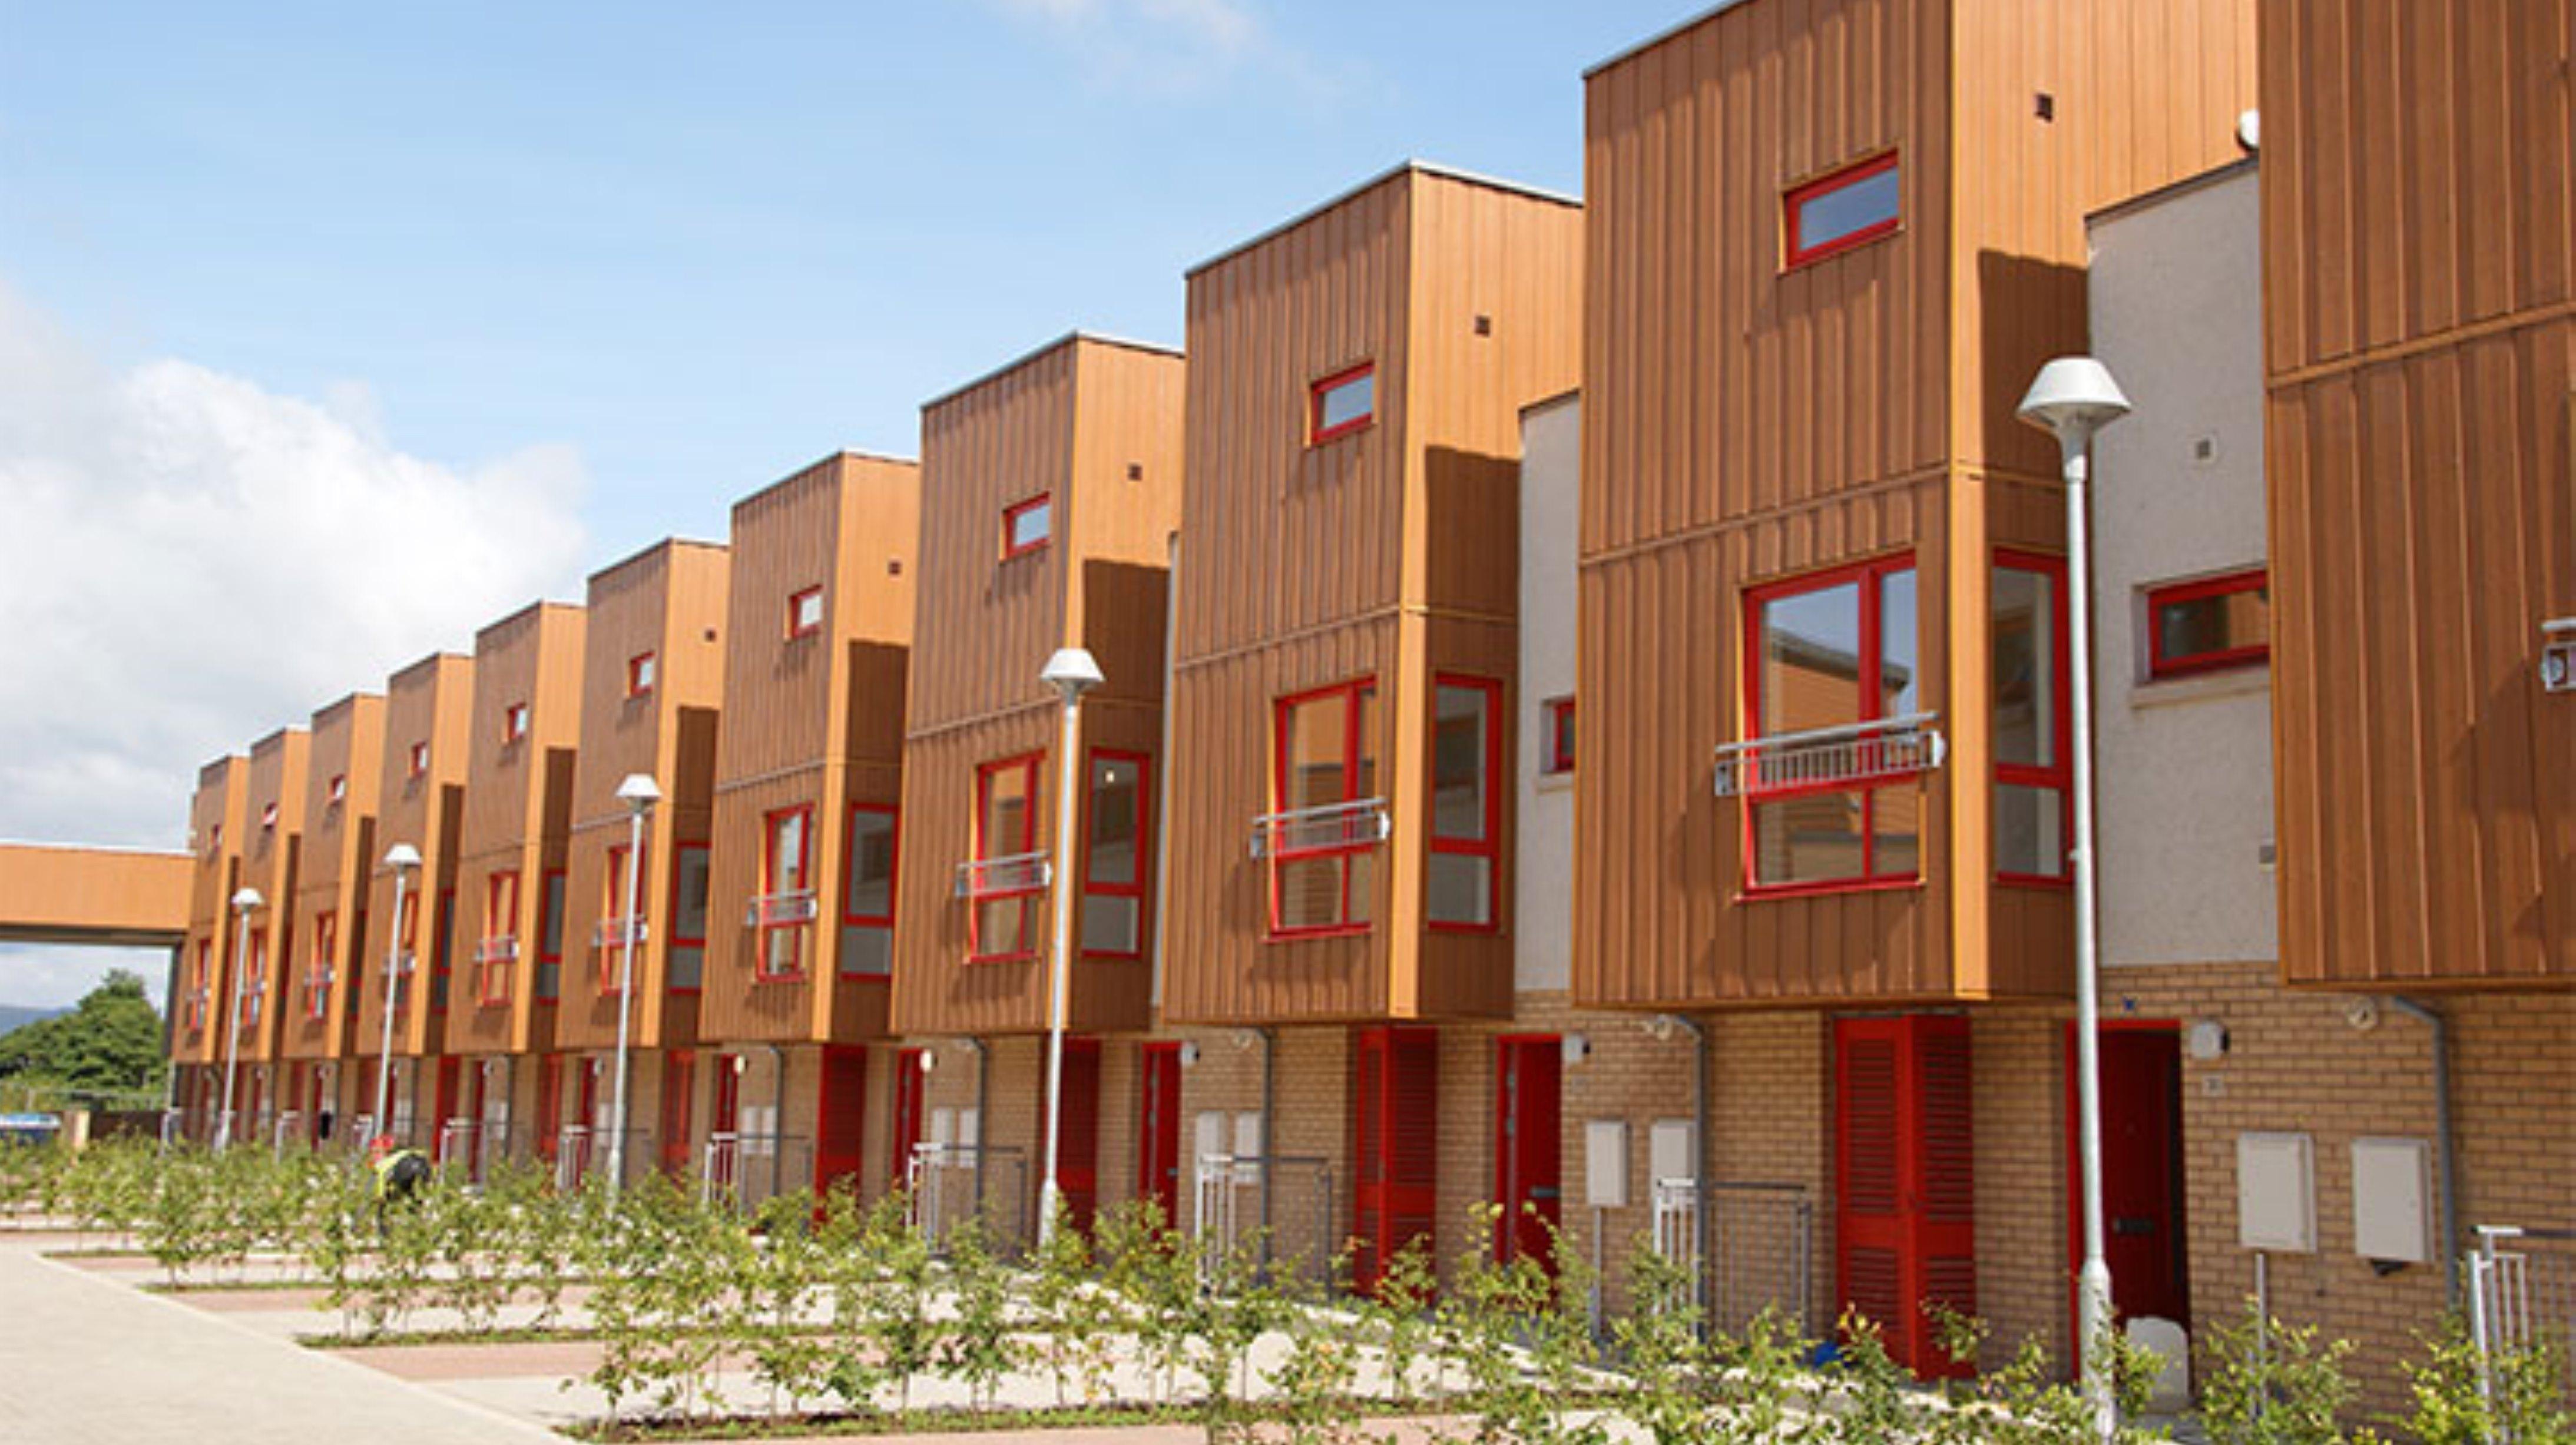 Maryhill locks new house buidling portfolio city building - Building a new house ...